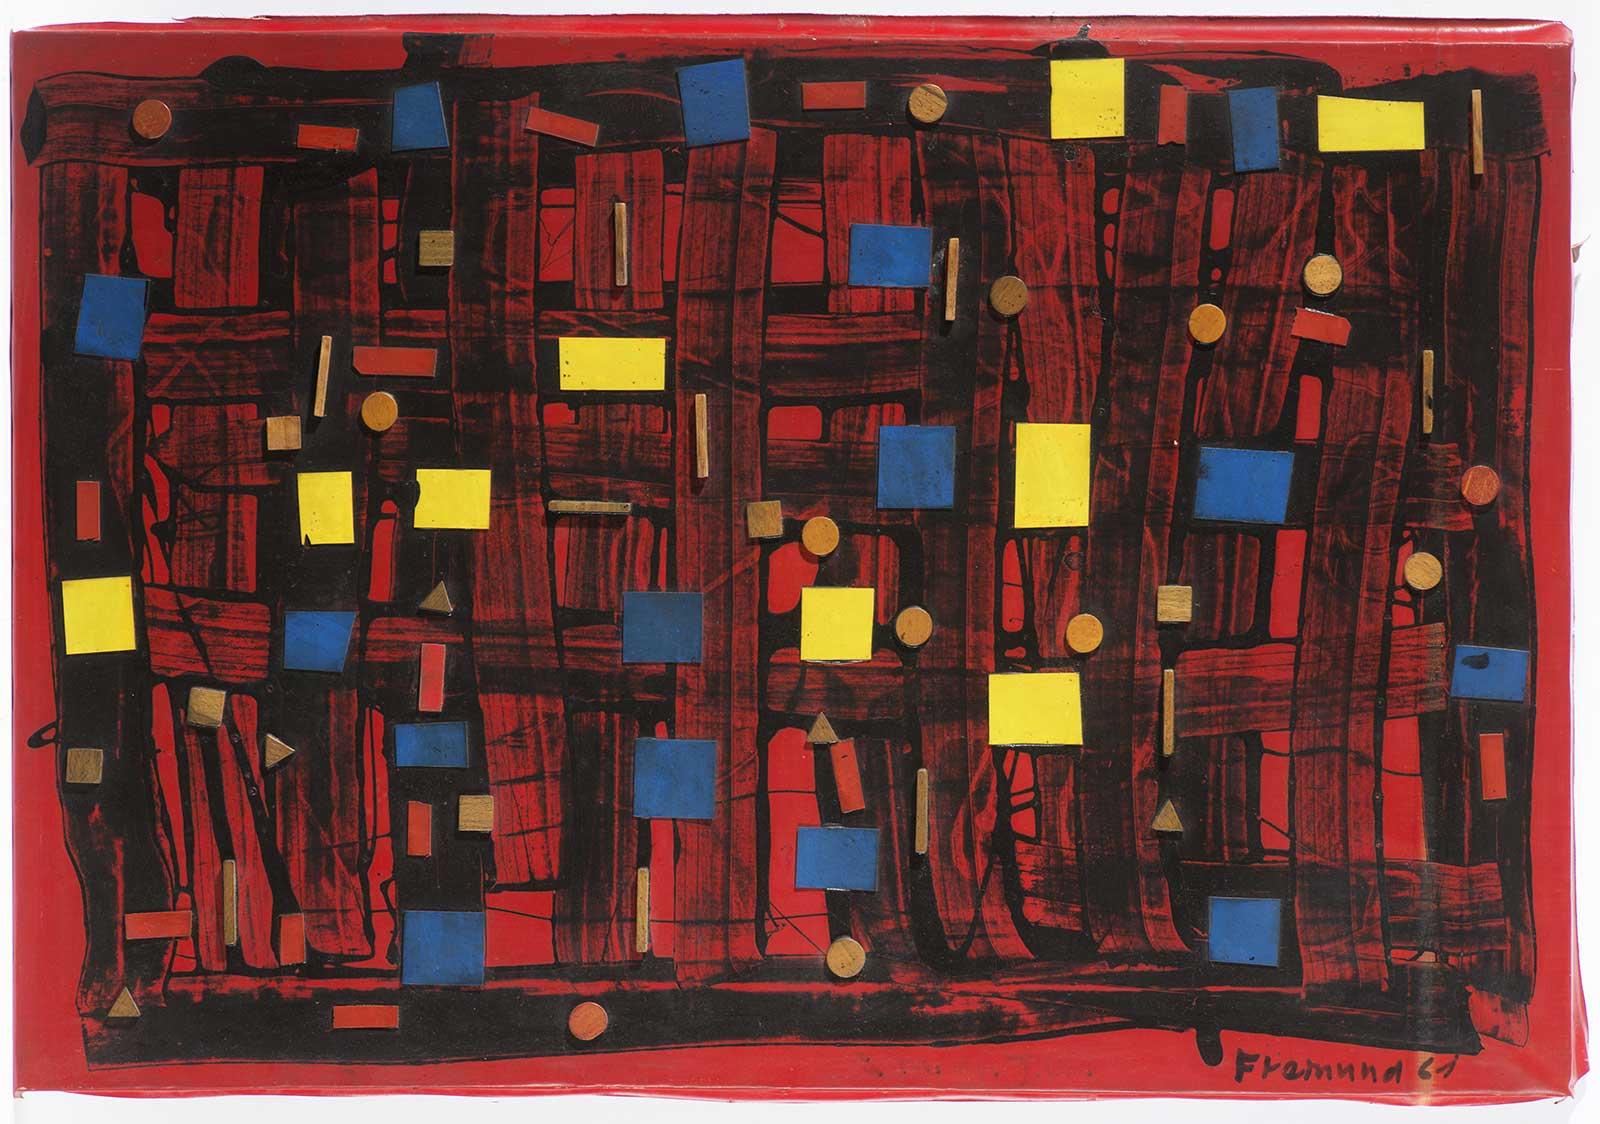 Arthouse-hejtmanek-richard-fremund-strukturalni-krajina